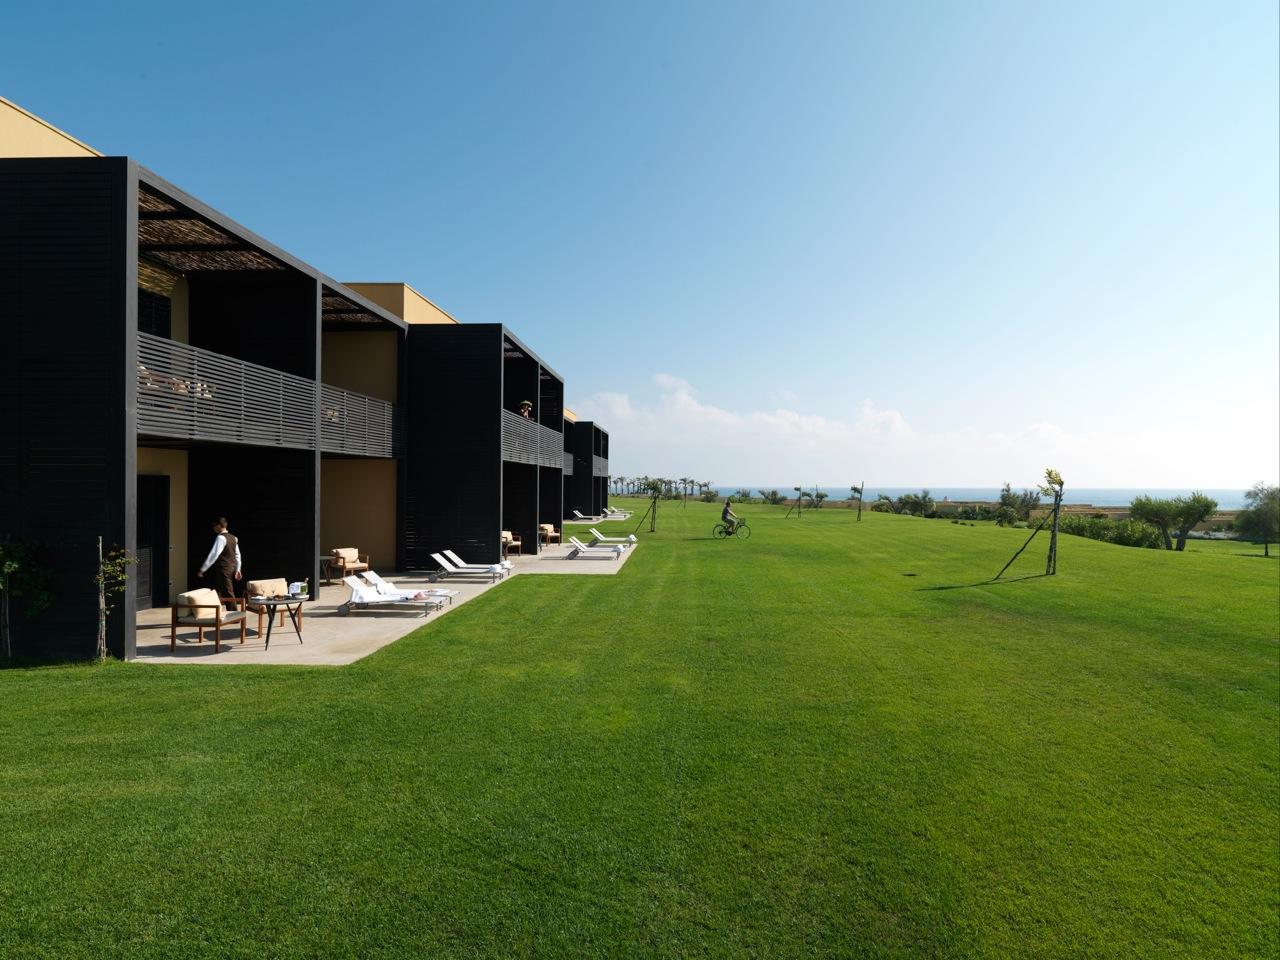 Verdura-Golf-Spa-Resort-Courtyard-Buildings-3378